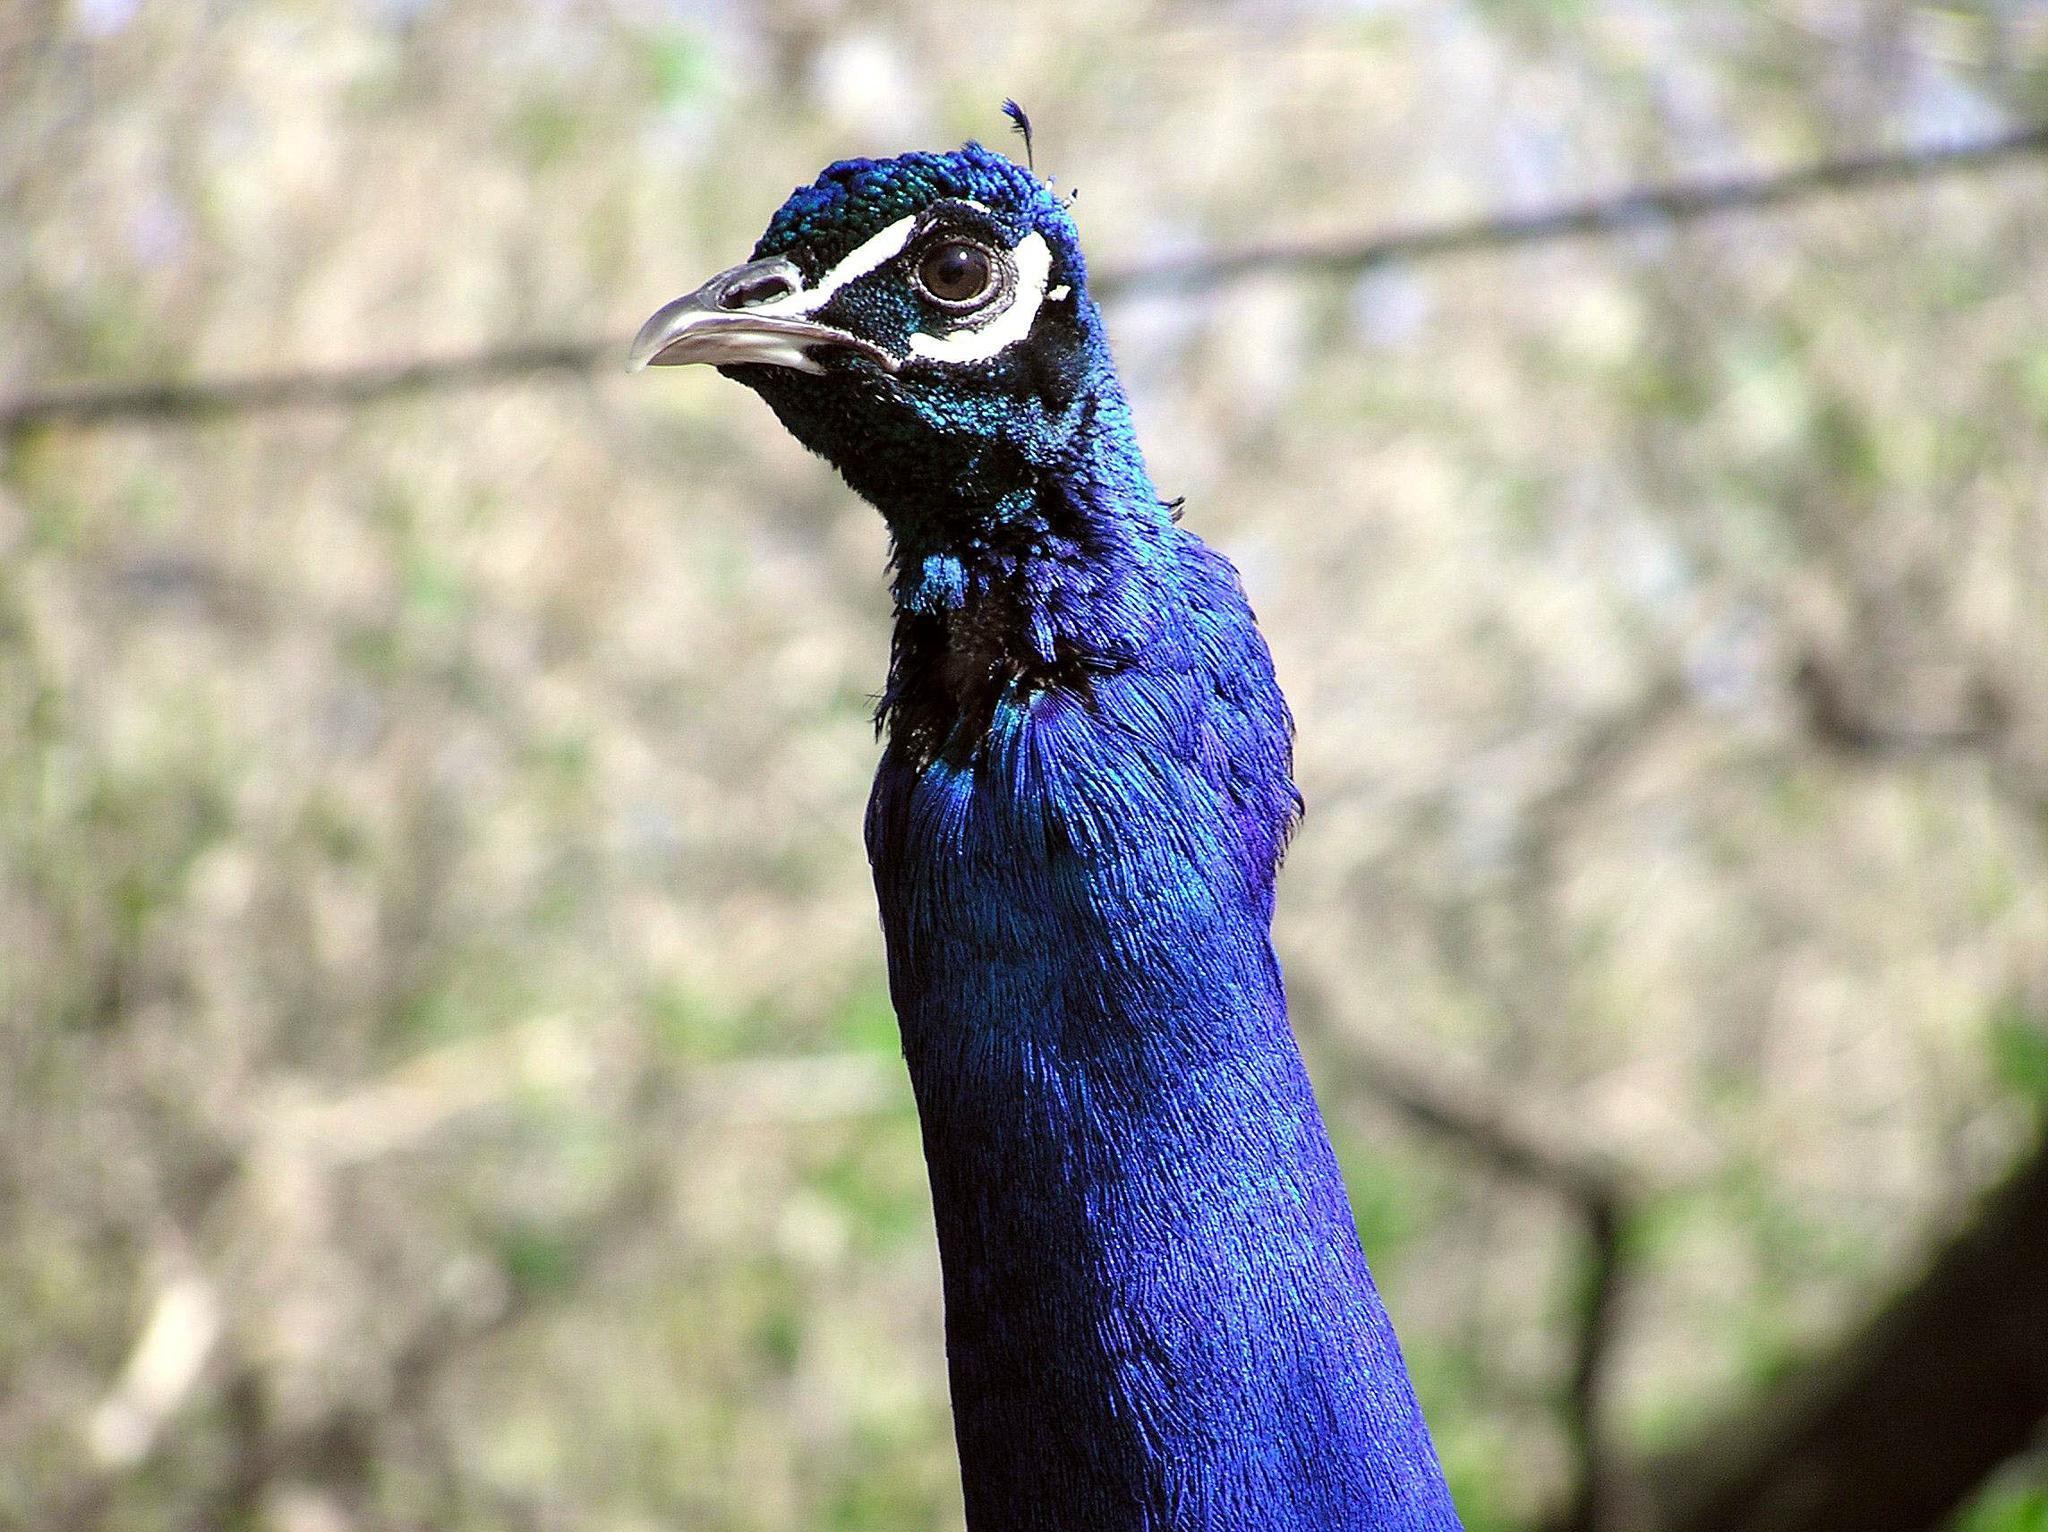 Peacock by steven.malecki.52